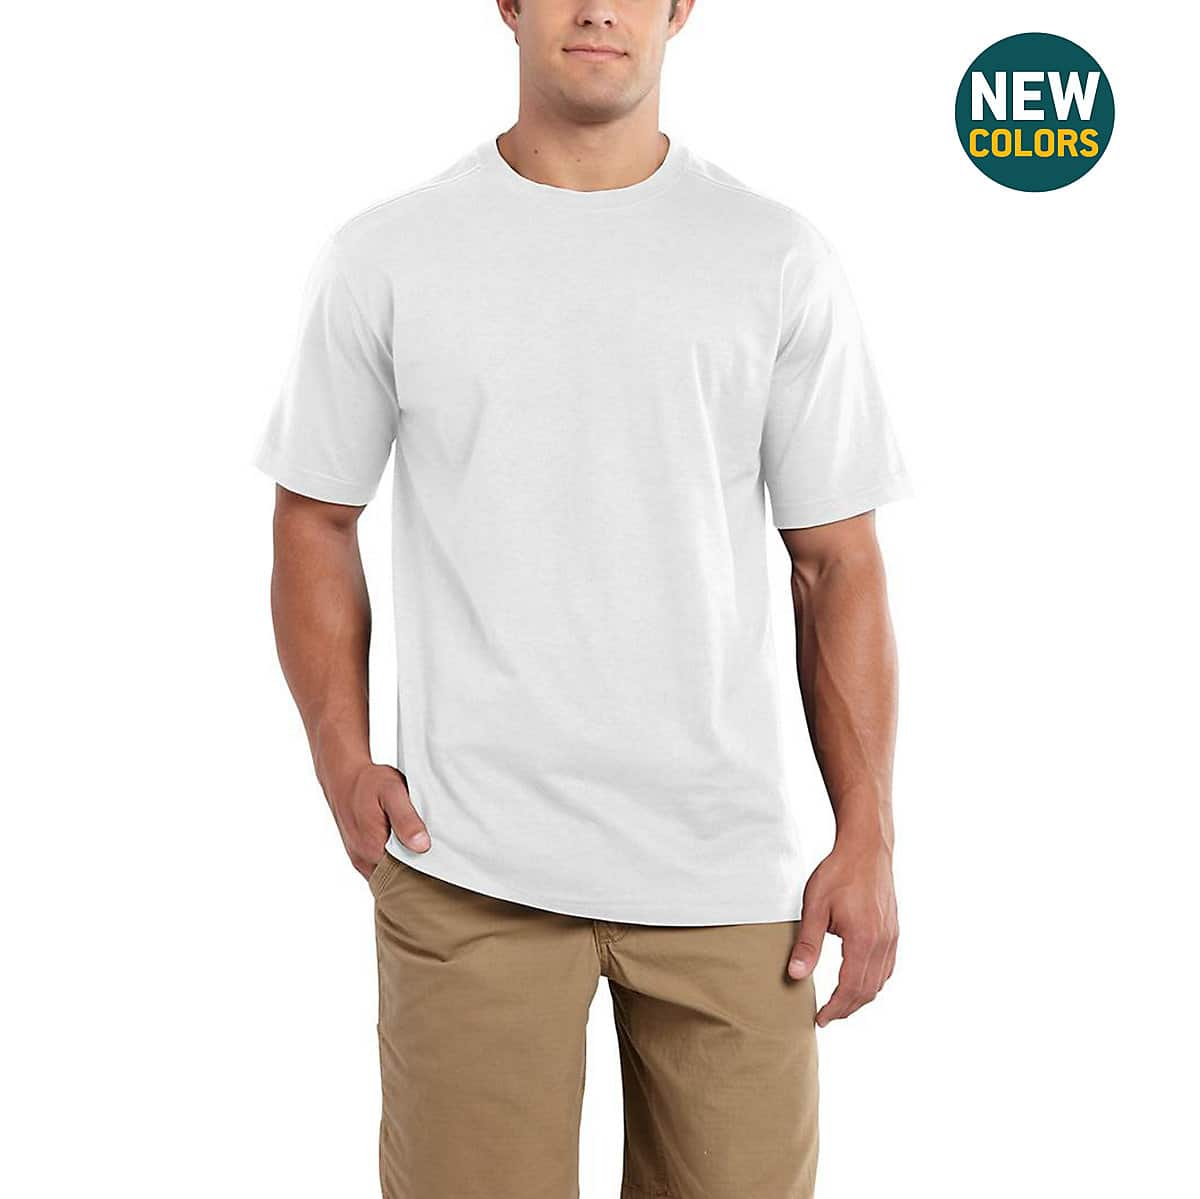 4cdcf47be Men's Maddock Non-Pocket Short-Sleeve T-Shirt 101124   Carhartt